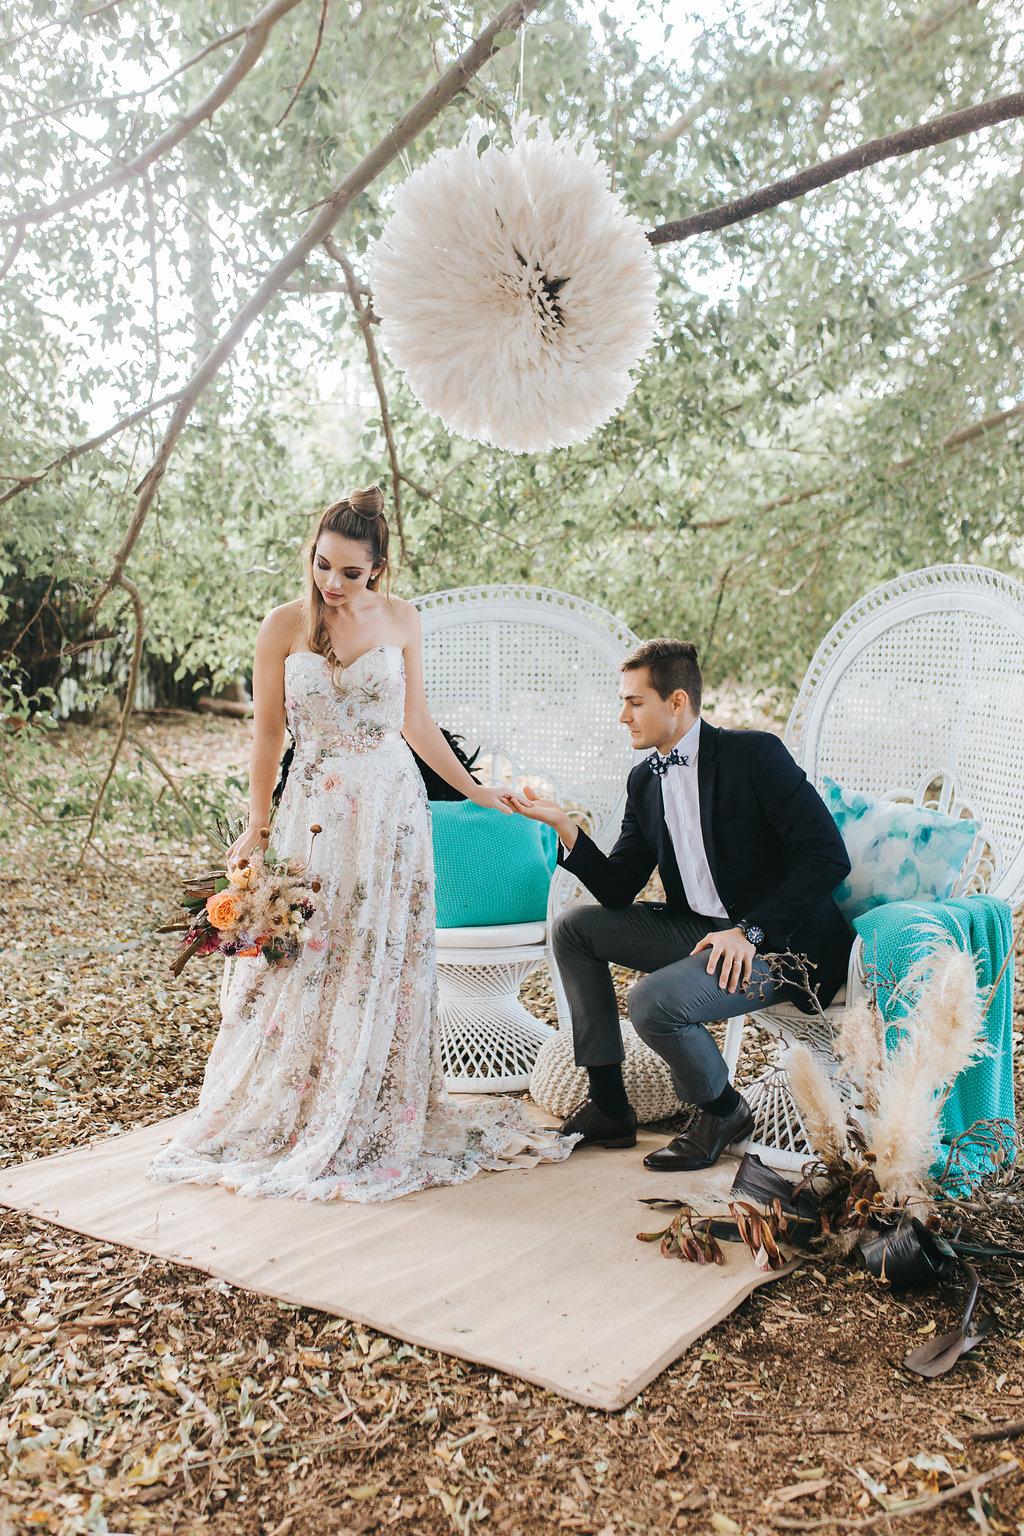 WirreandaParkStyledShoot_MSP_HighRes(149of212).jpgBloodwood Botanica   Bohemian bright wedding